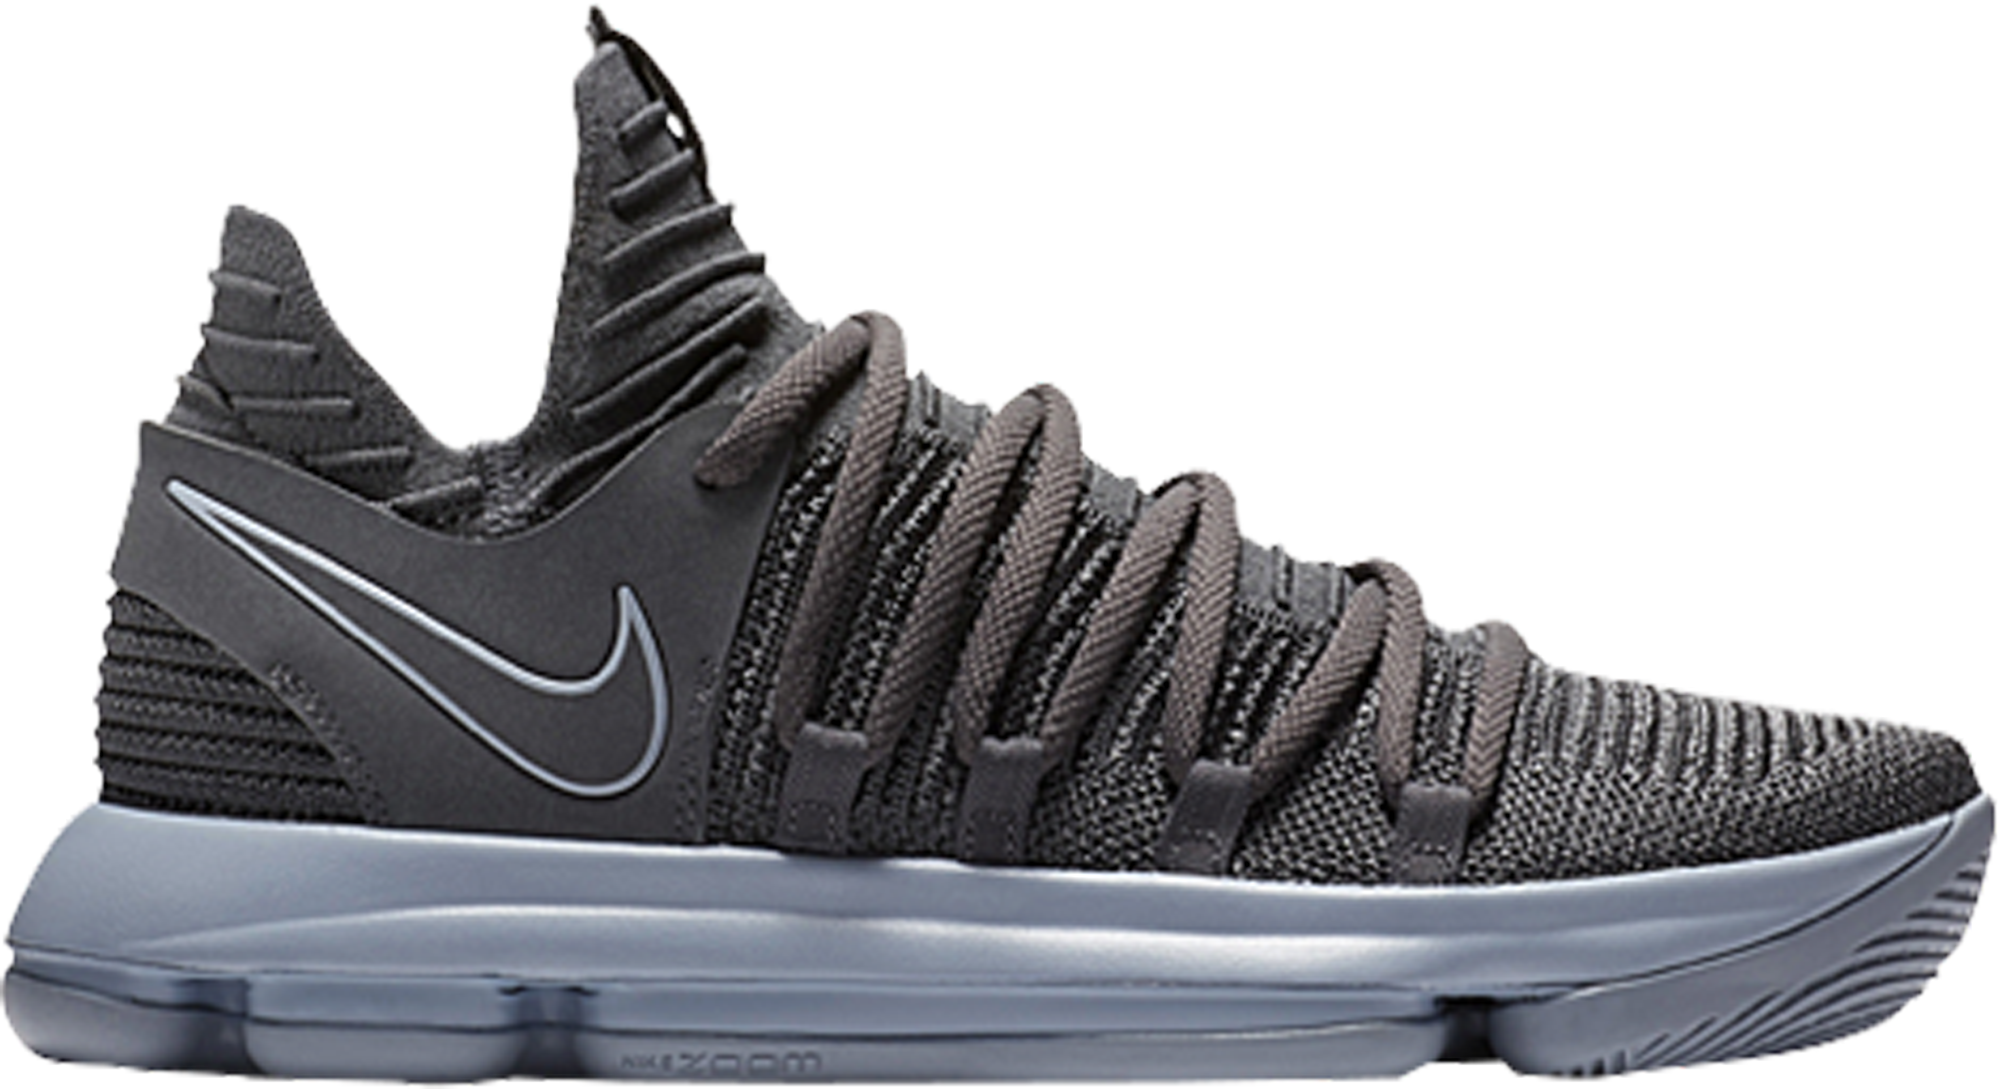 Nike KD 10 Dark Grey - 897815-005